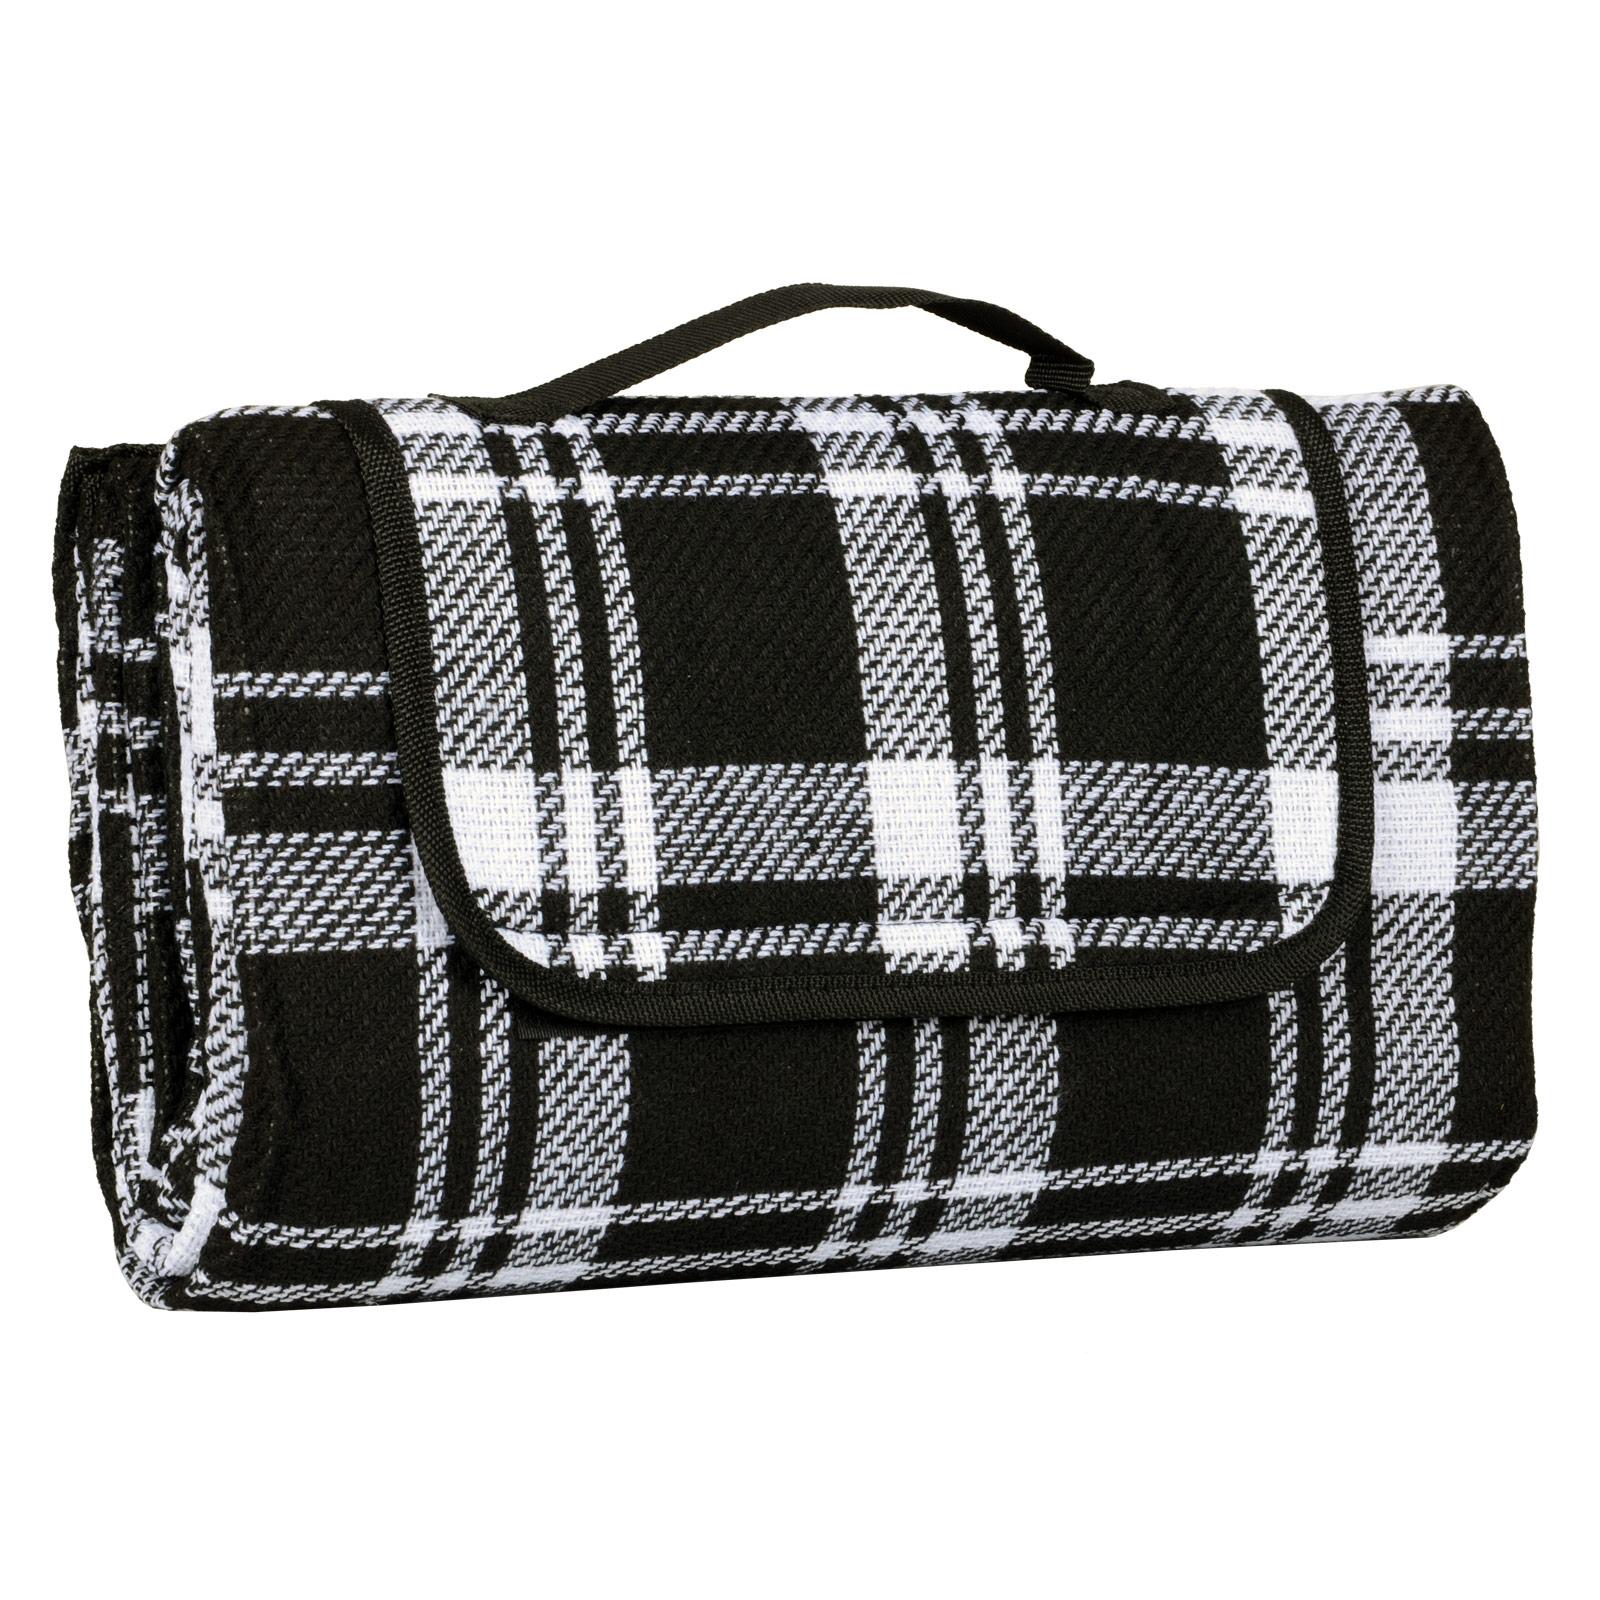 New Large 59x51 034 Outdoor Waterproof Picnic Blanket